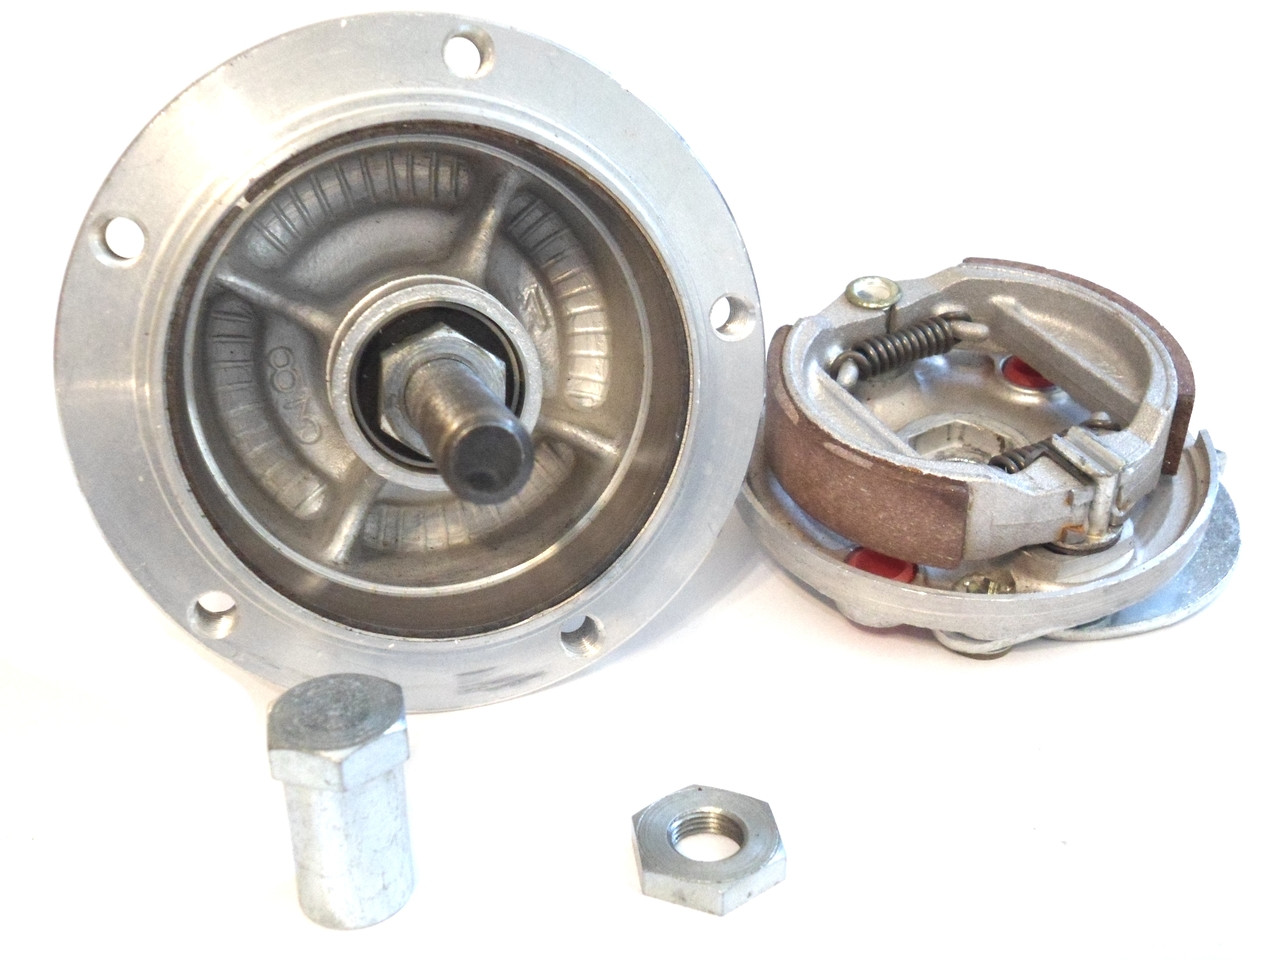 NOS Leleu 5 Star Front OFFSET Wheel Hub, 11mm Sealed Bearing - Complete